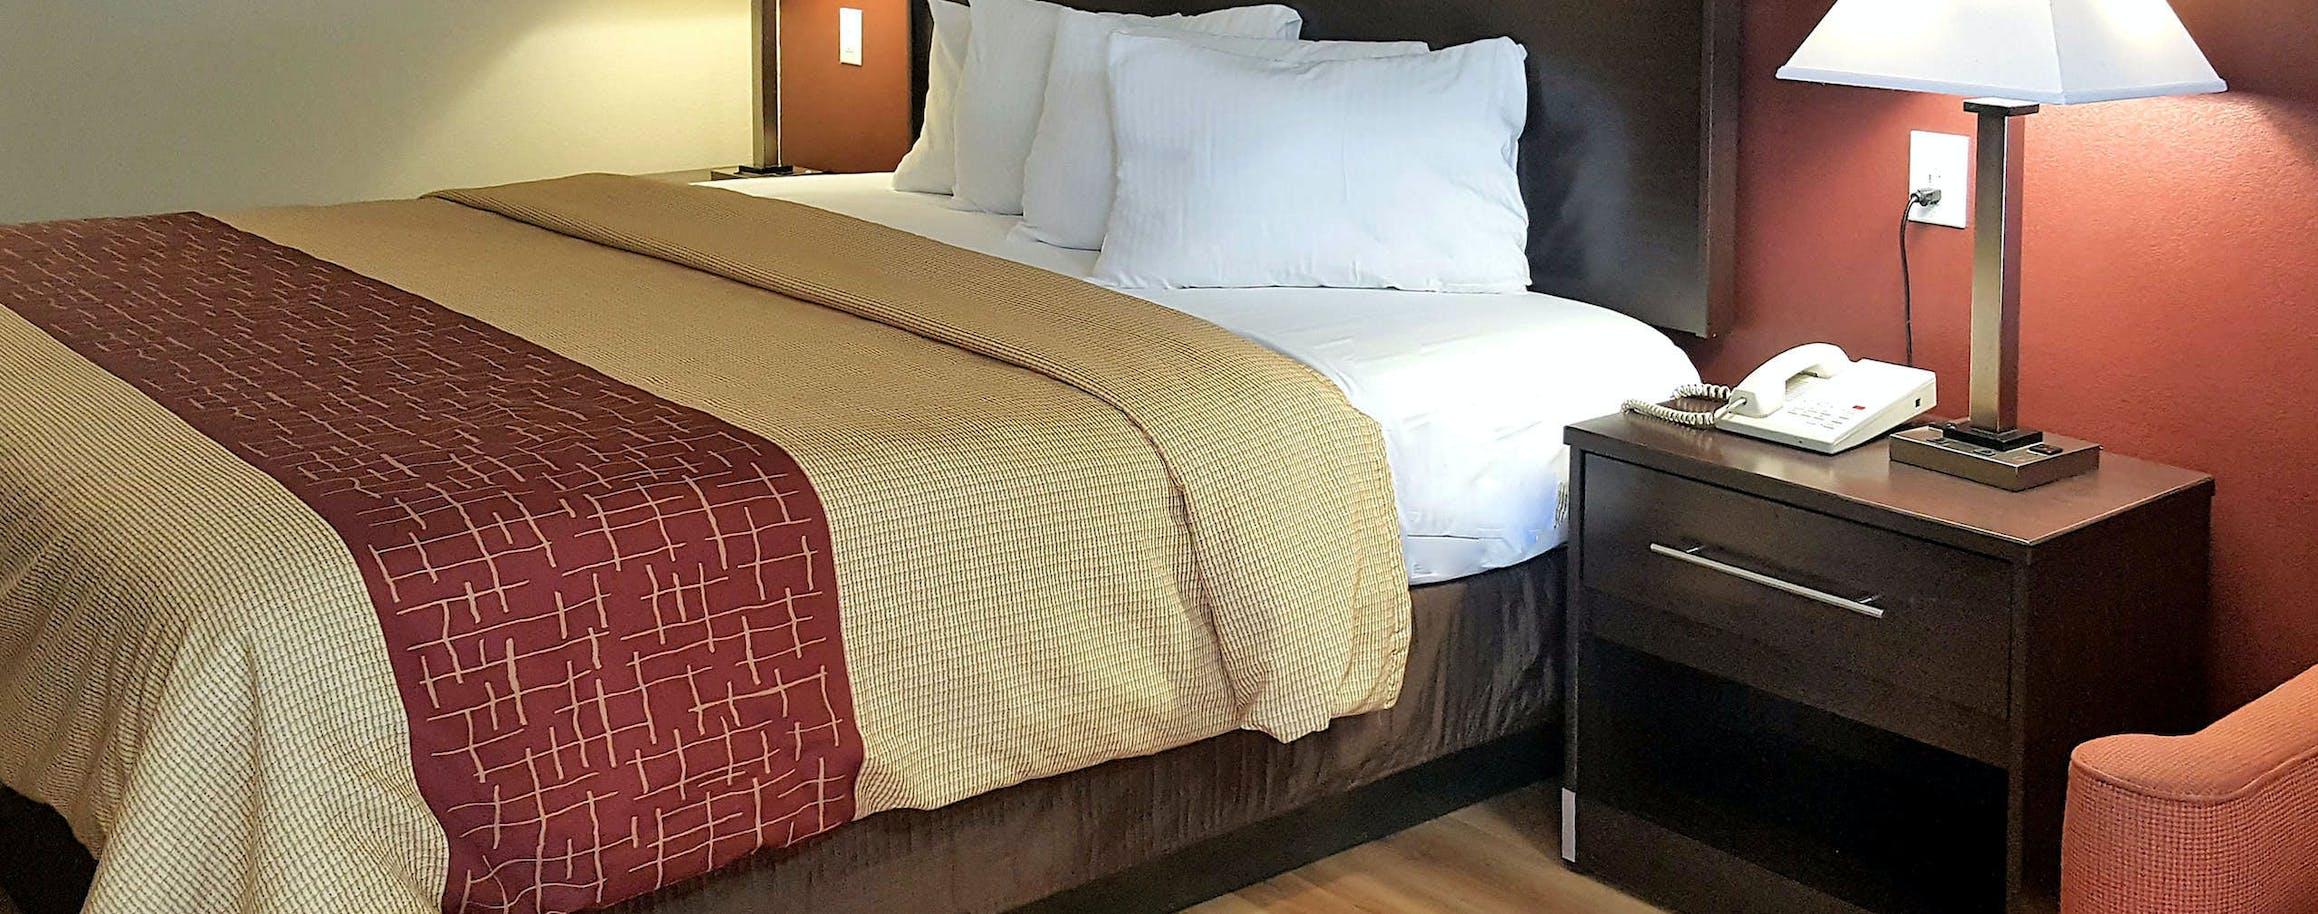 Red Roof Inn Arlington Fort Worth Hoteltonight